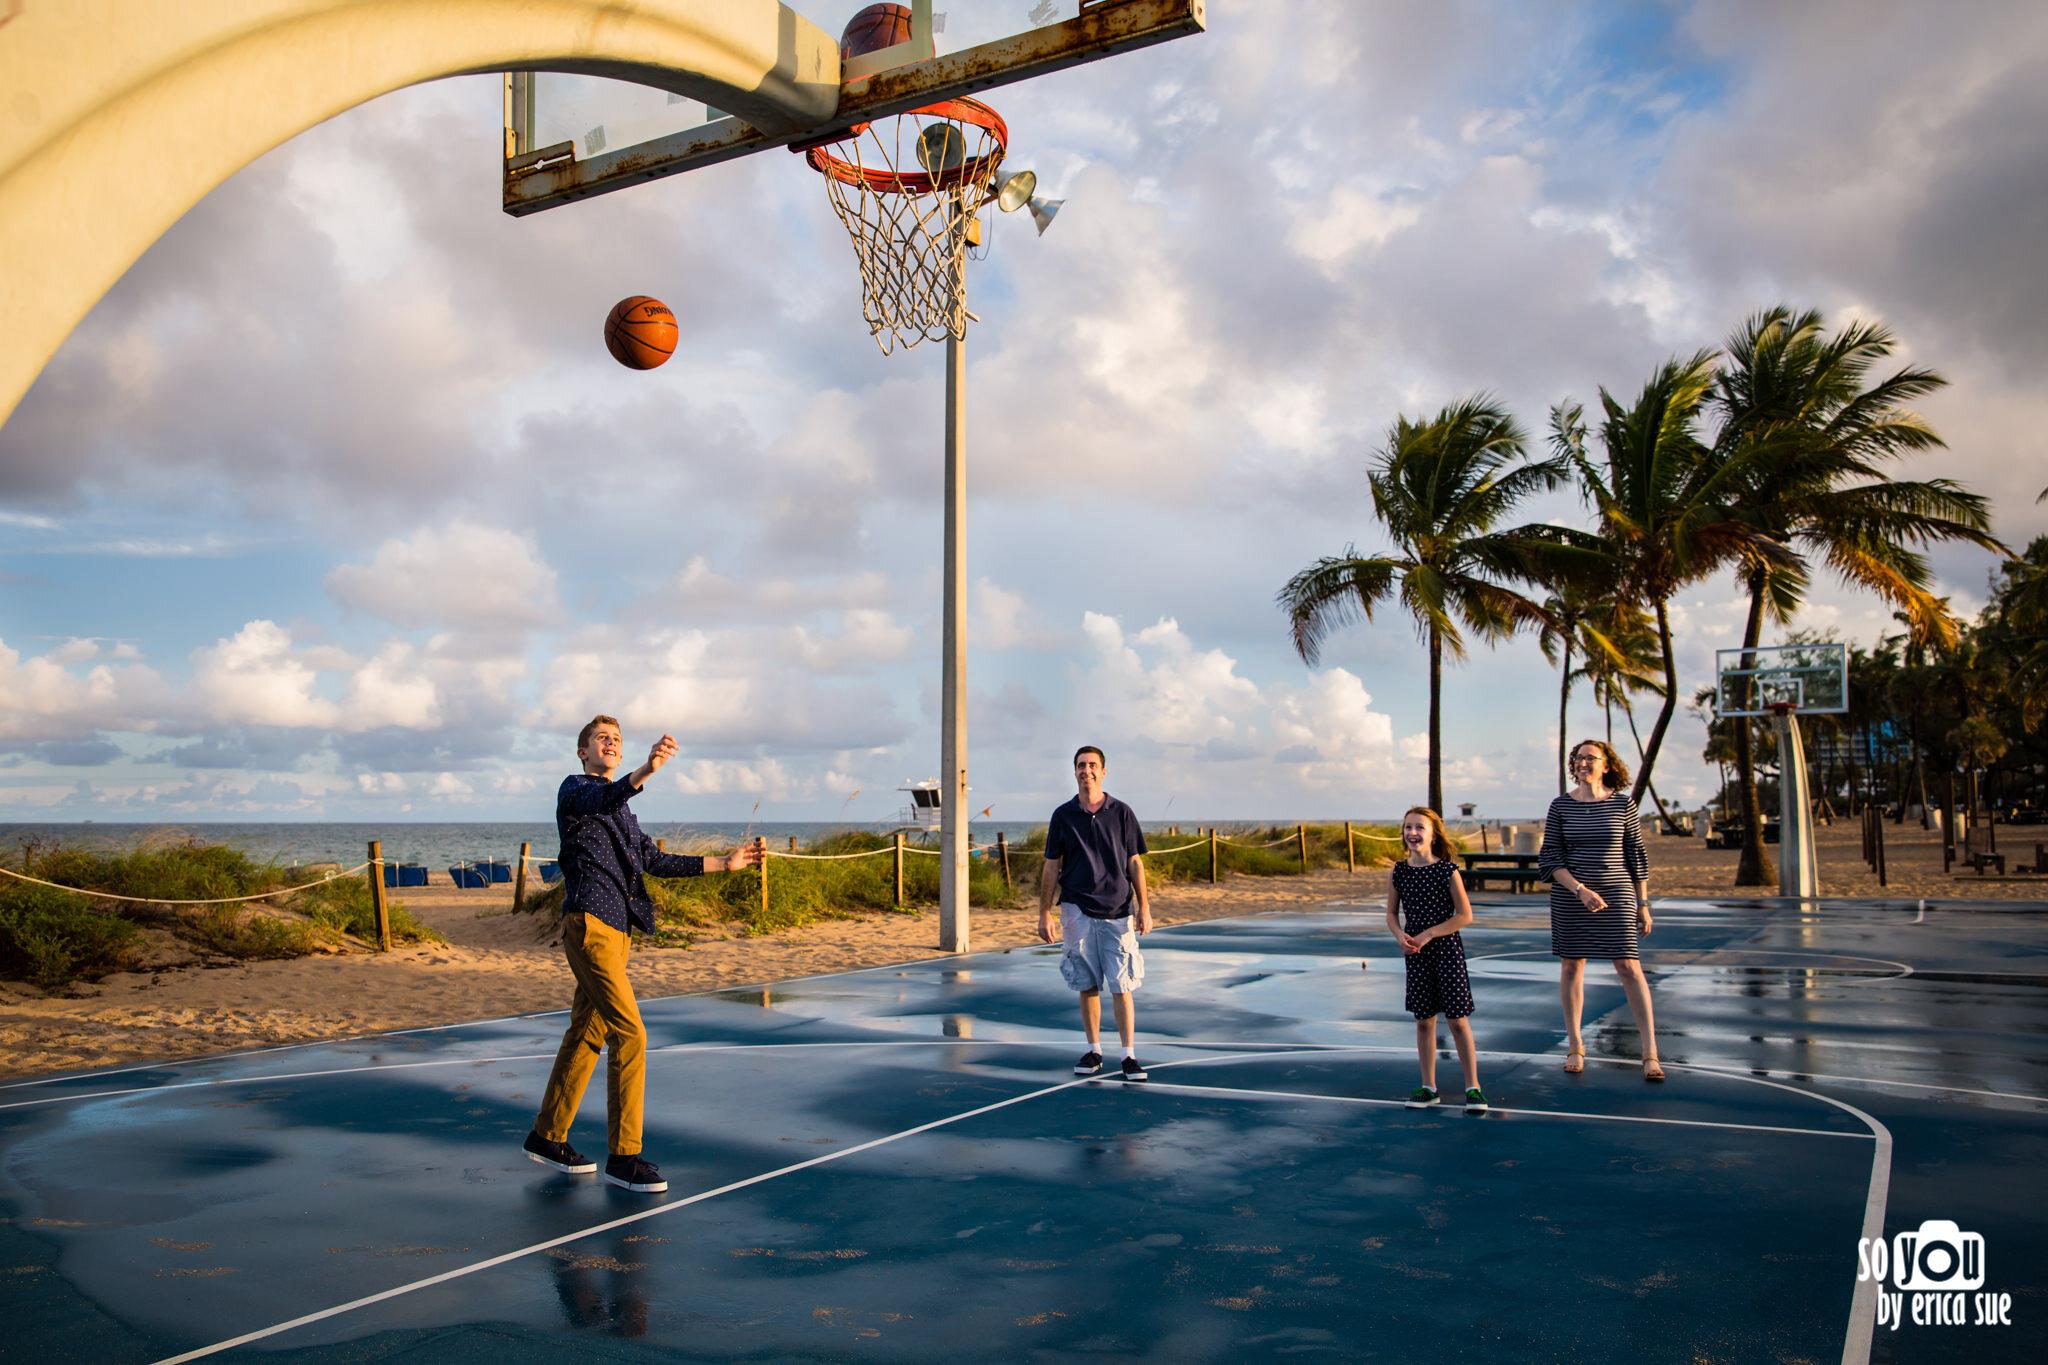 so-you-by-erica-sue-ft-lauderdale-beach-basketball-mitzvah-pre-shoot--4.JPG